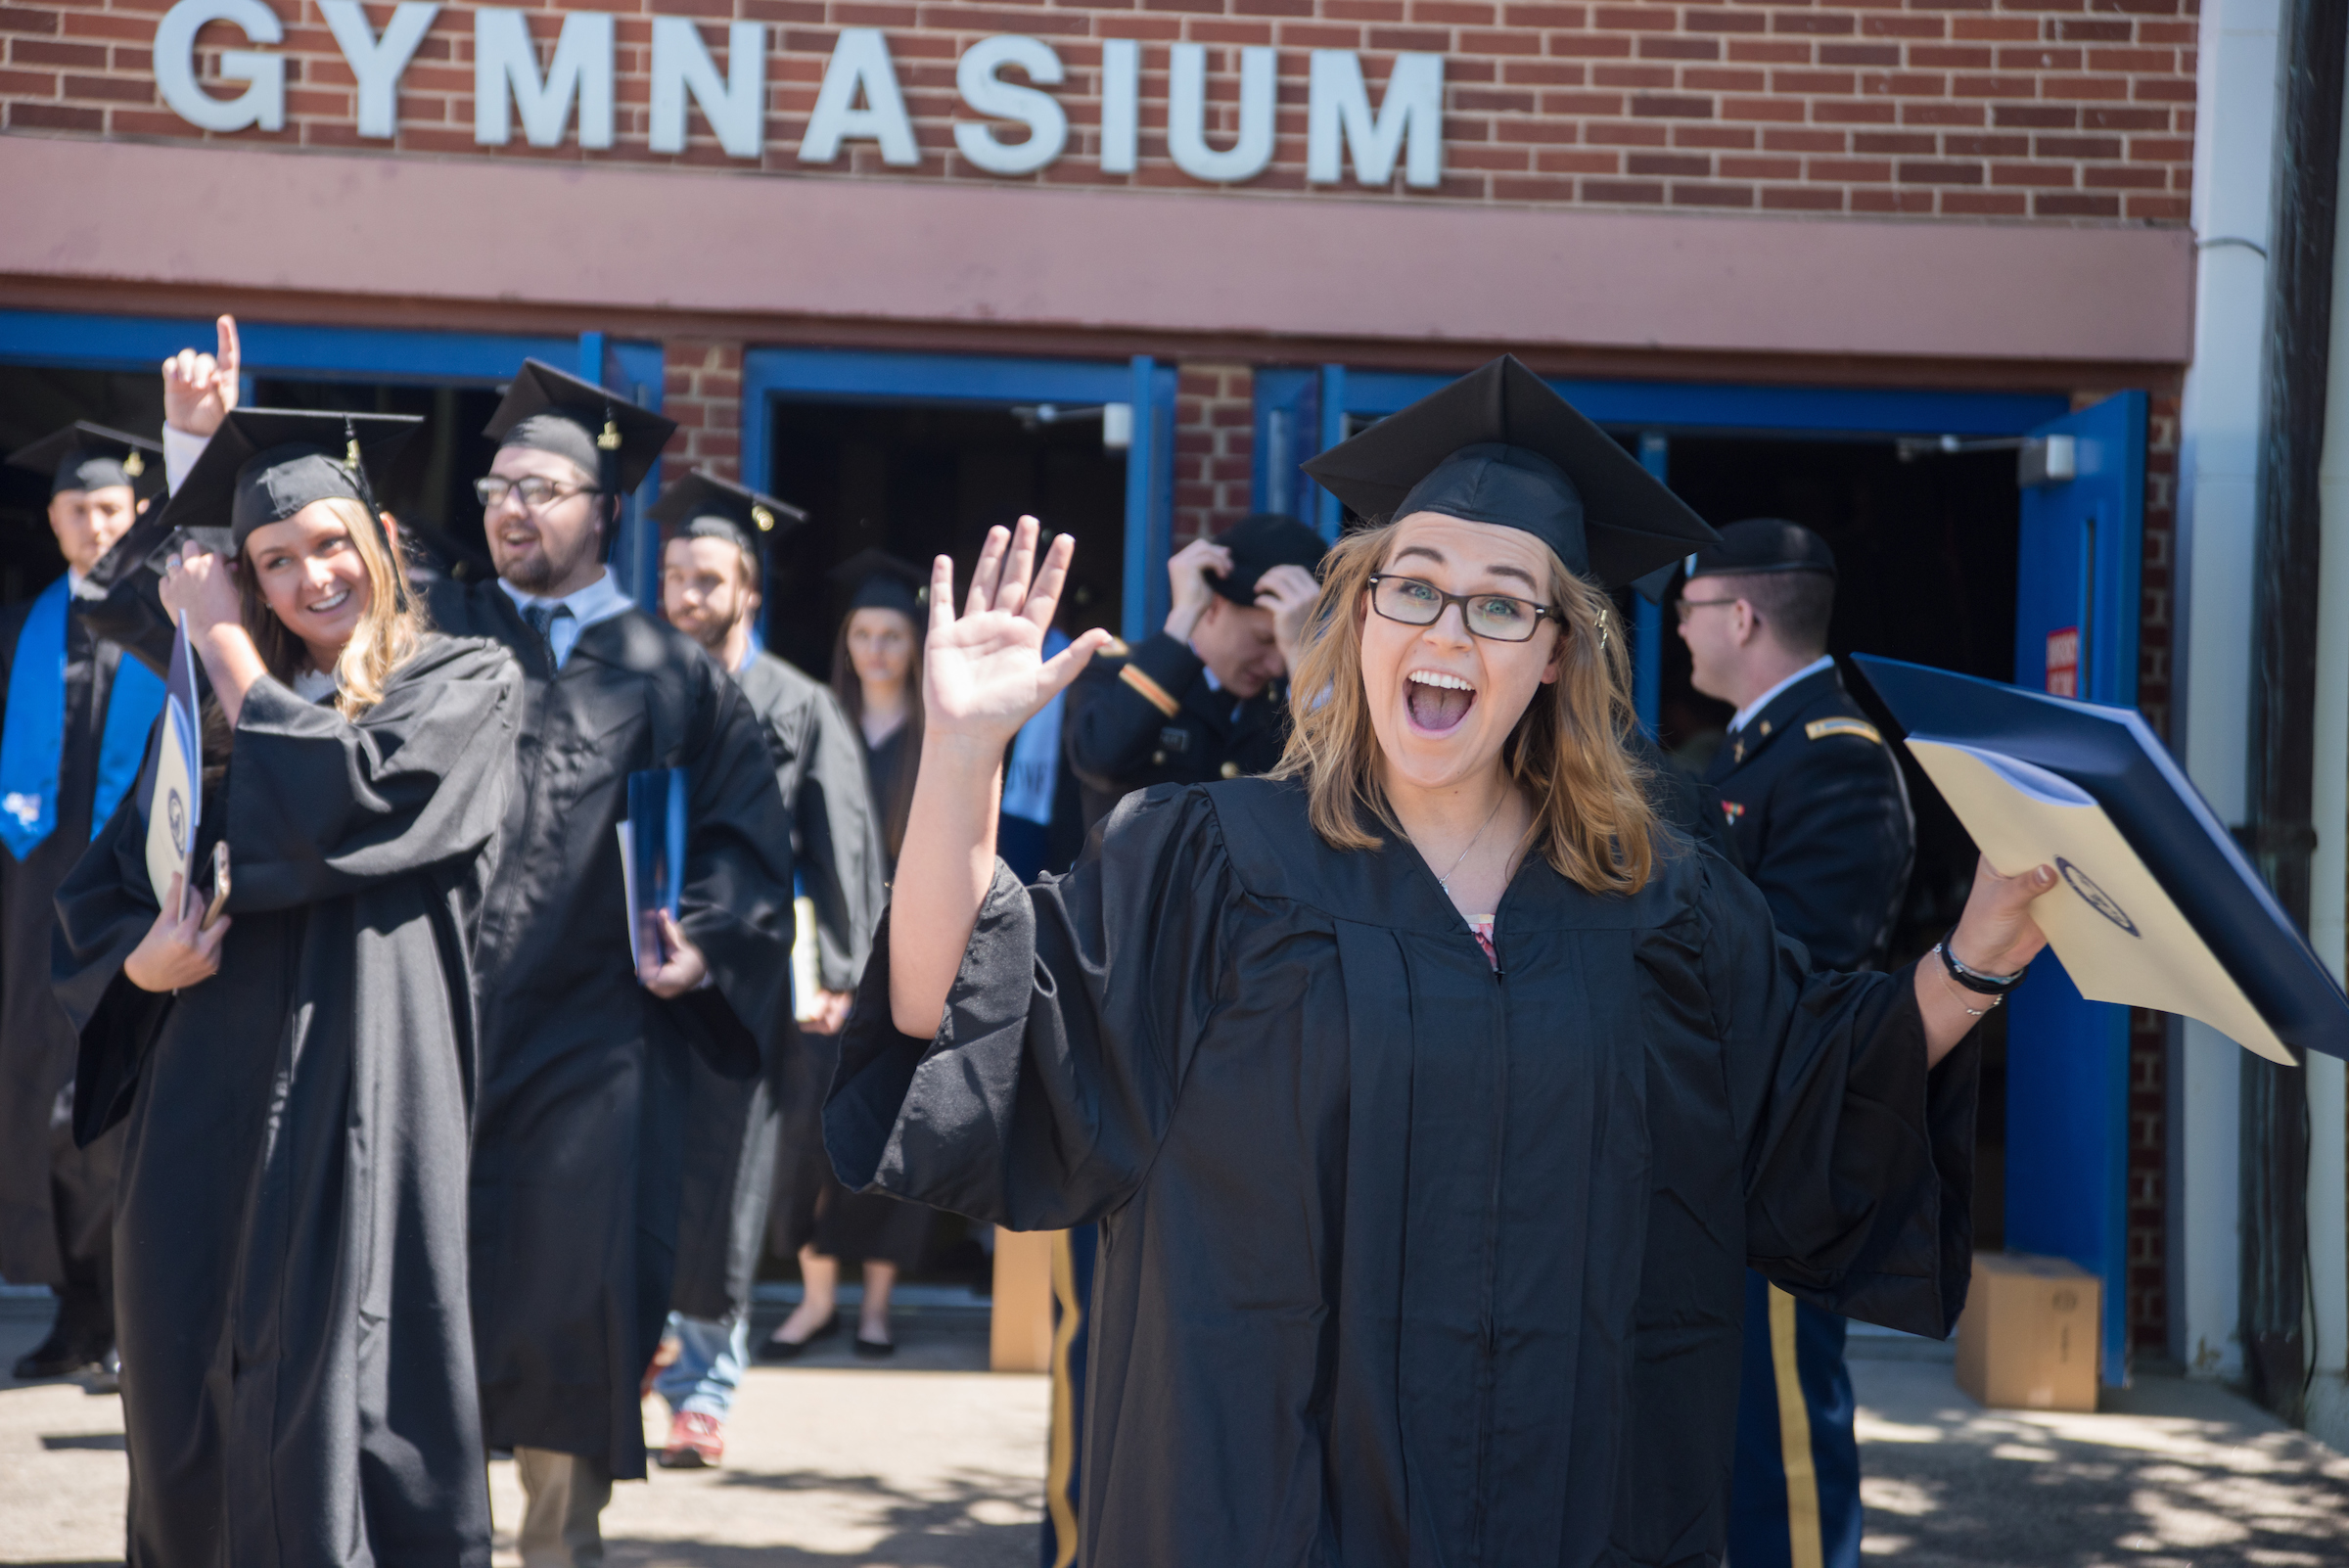 University of North Georgia graduate celebrates after graduating.